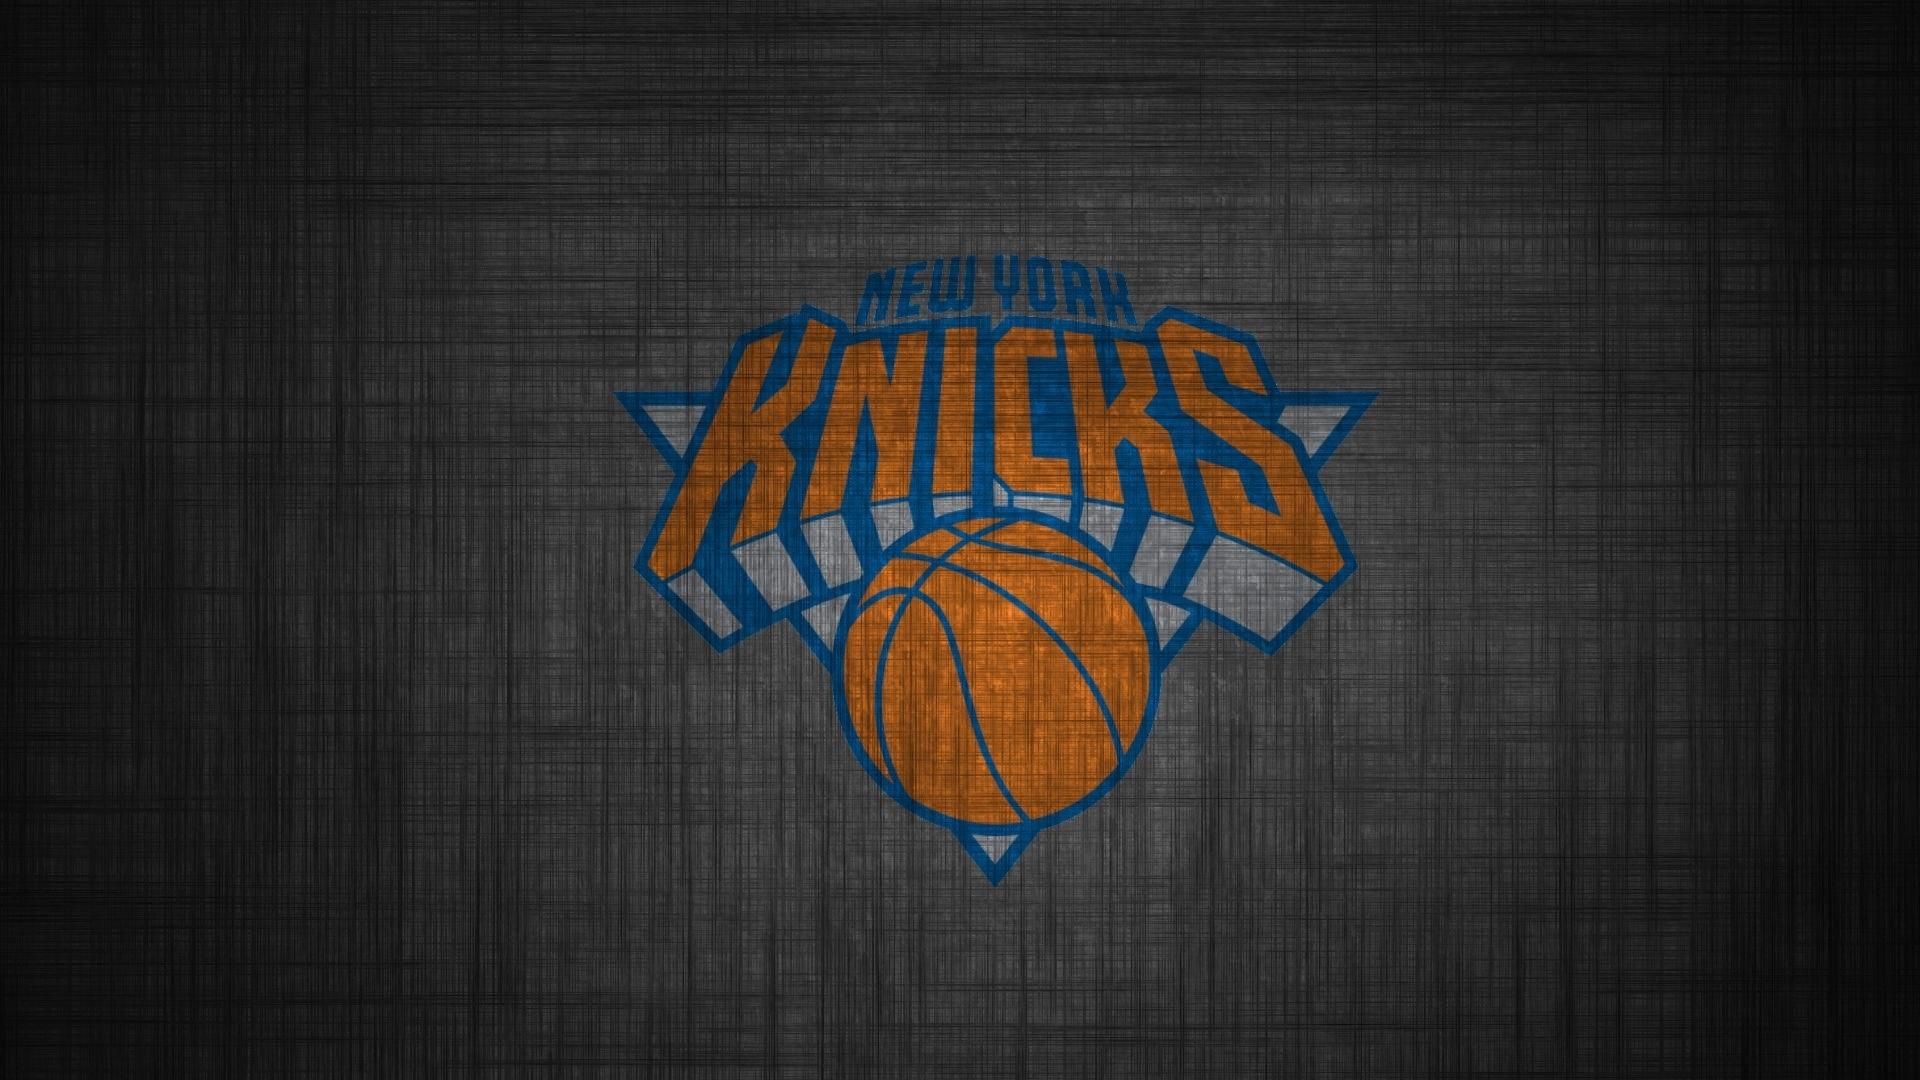 new york knicks 2017 wallpaper desktop background ~ desktop